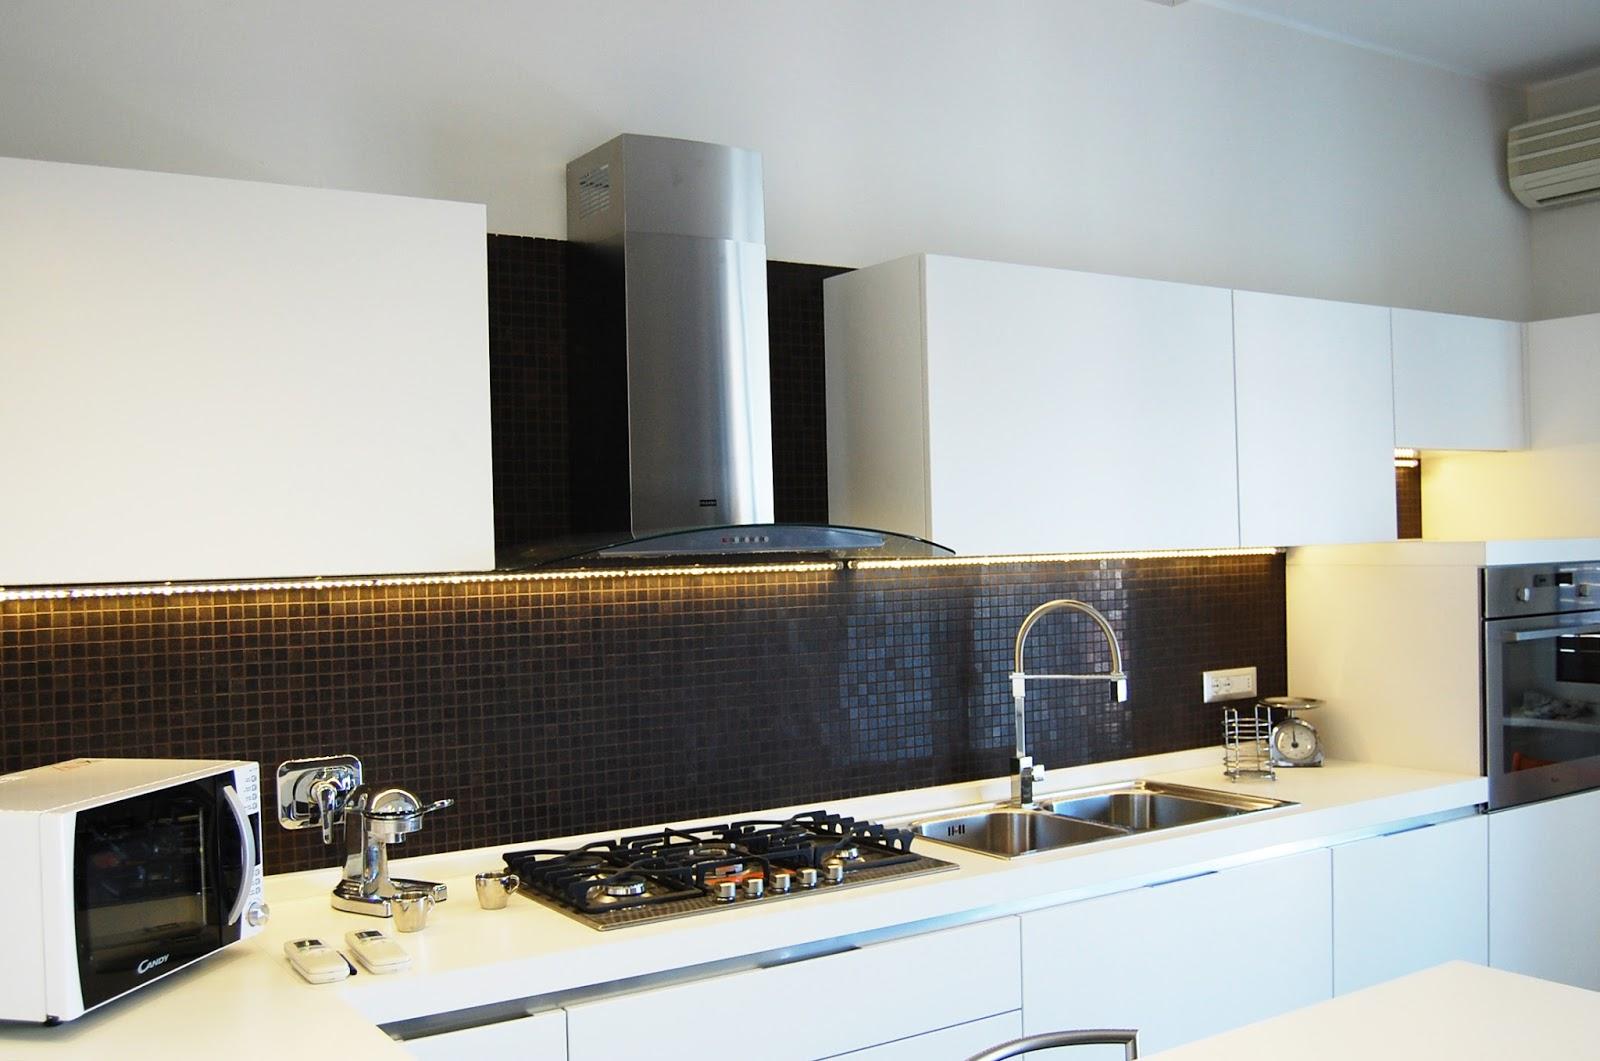 Illuminazione led casa illuminazione sottopensile a led - Striscia led sottopensile cucina ...